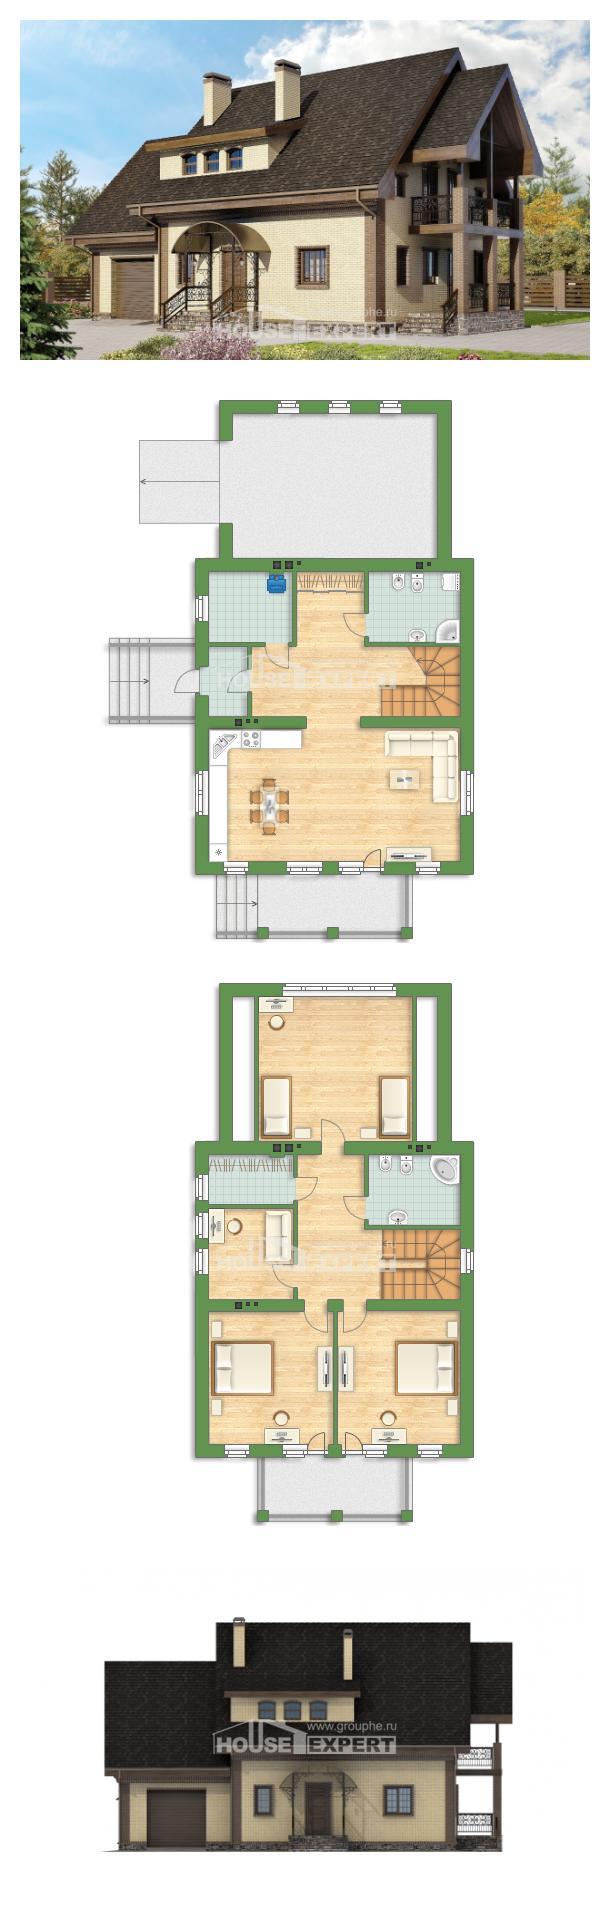 Проект дома 185-003-Л | House Expert